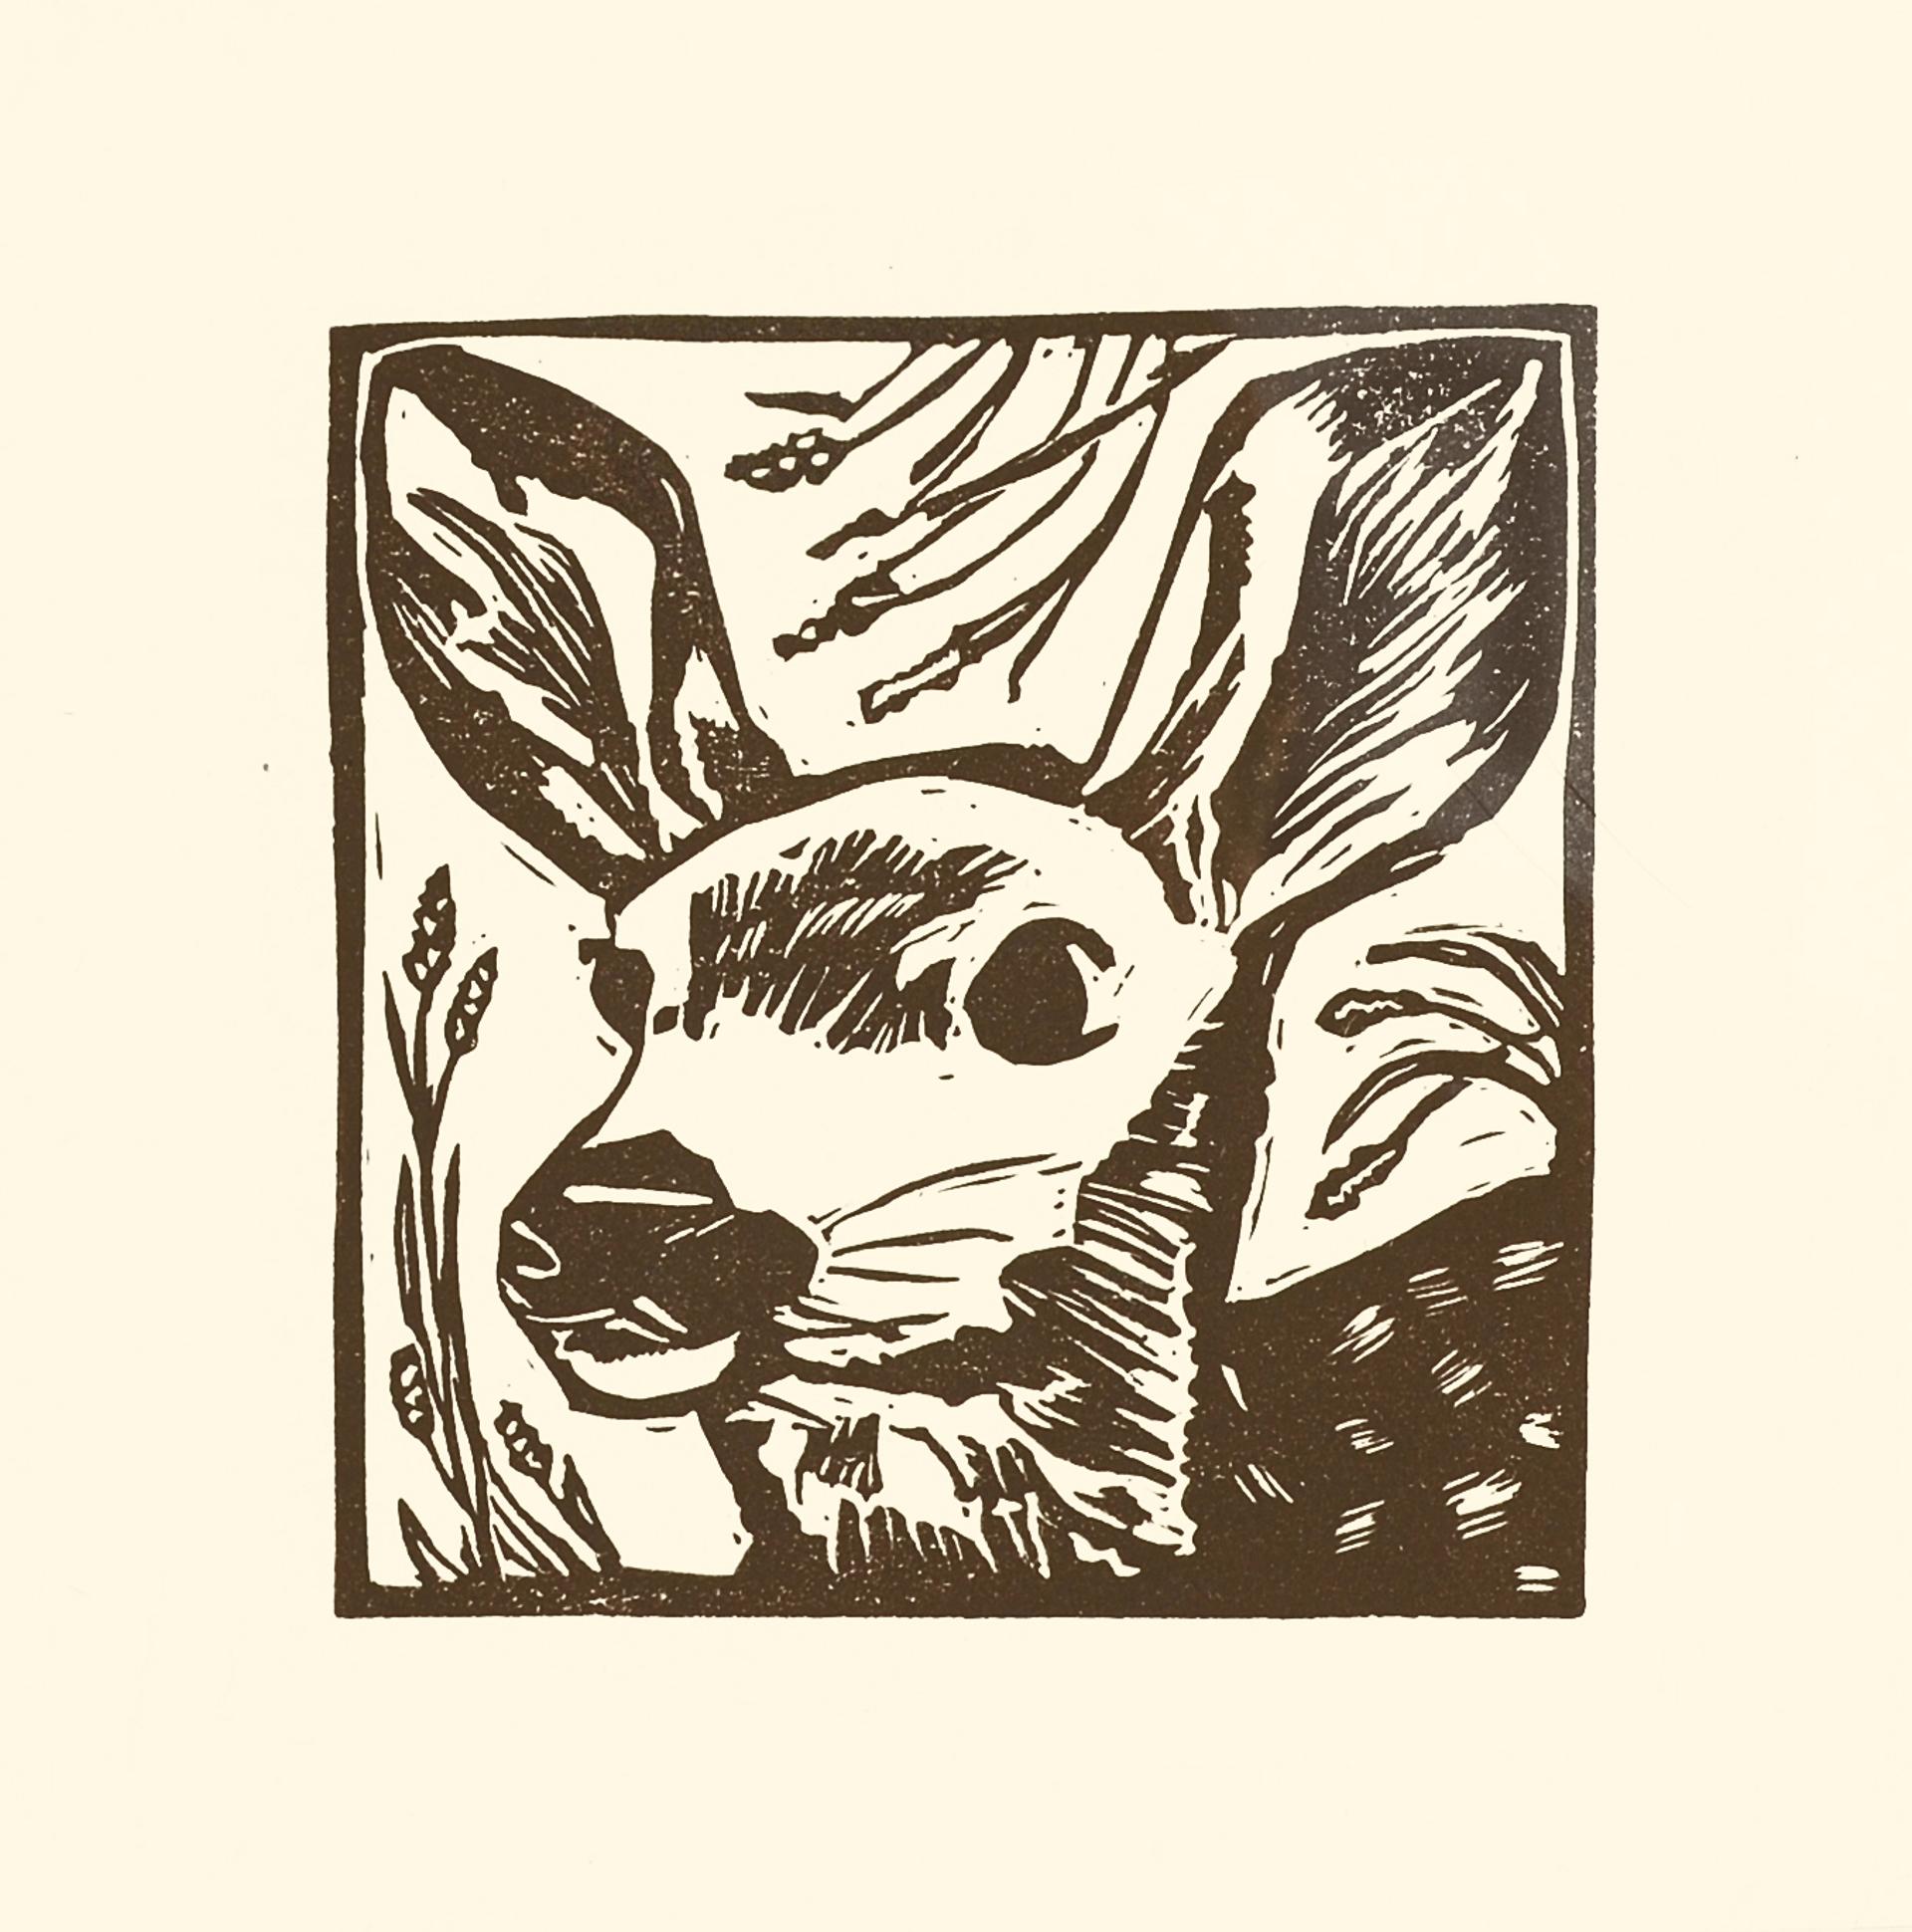 Mule Deer Fawn by Kat Kinnick